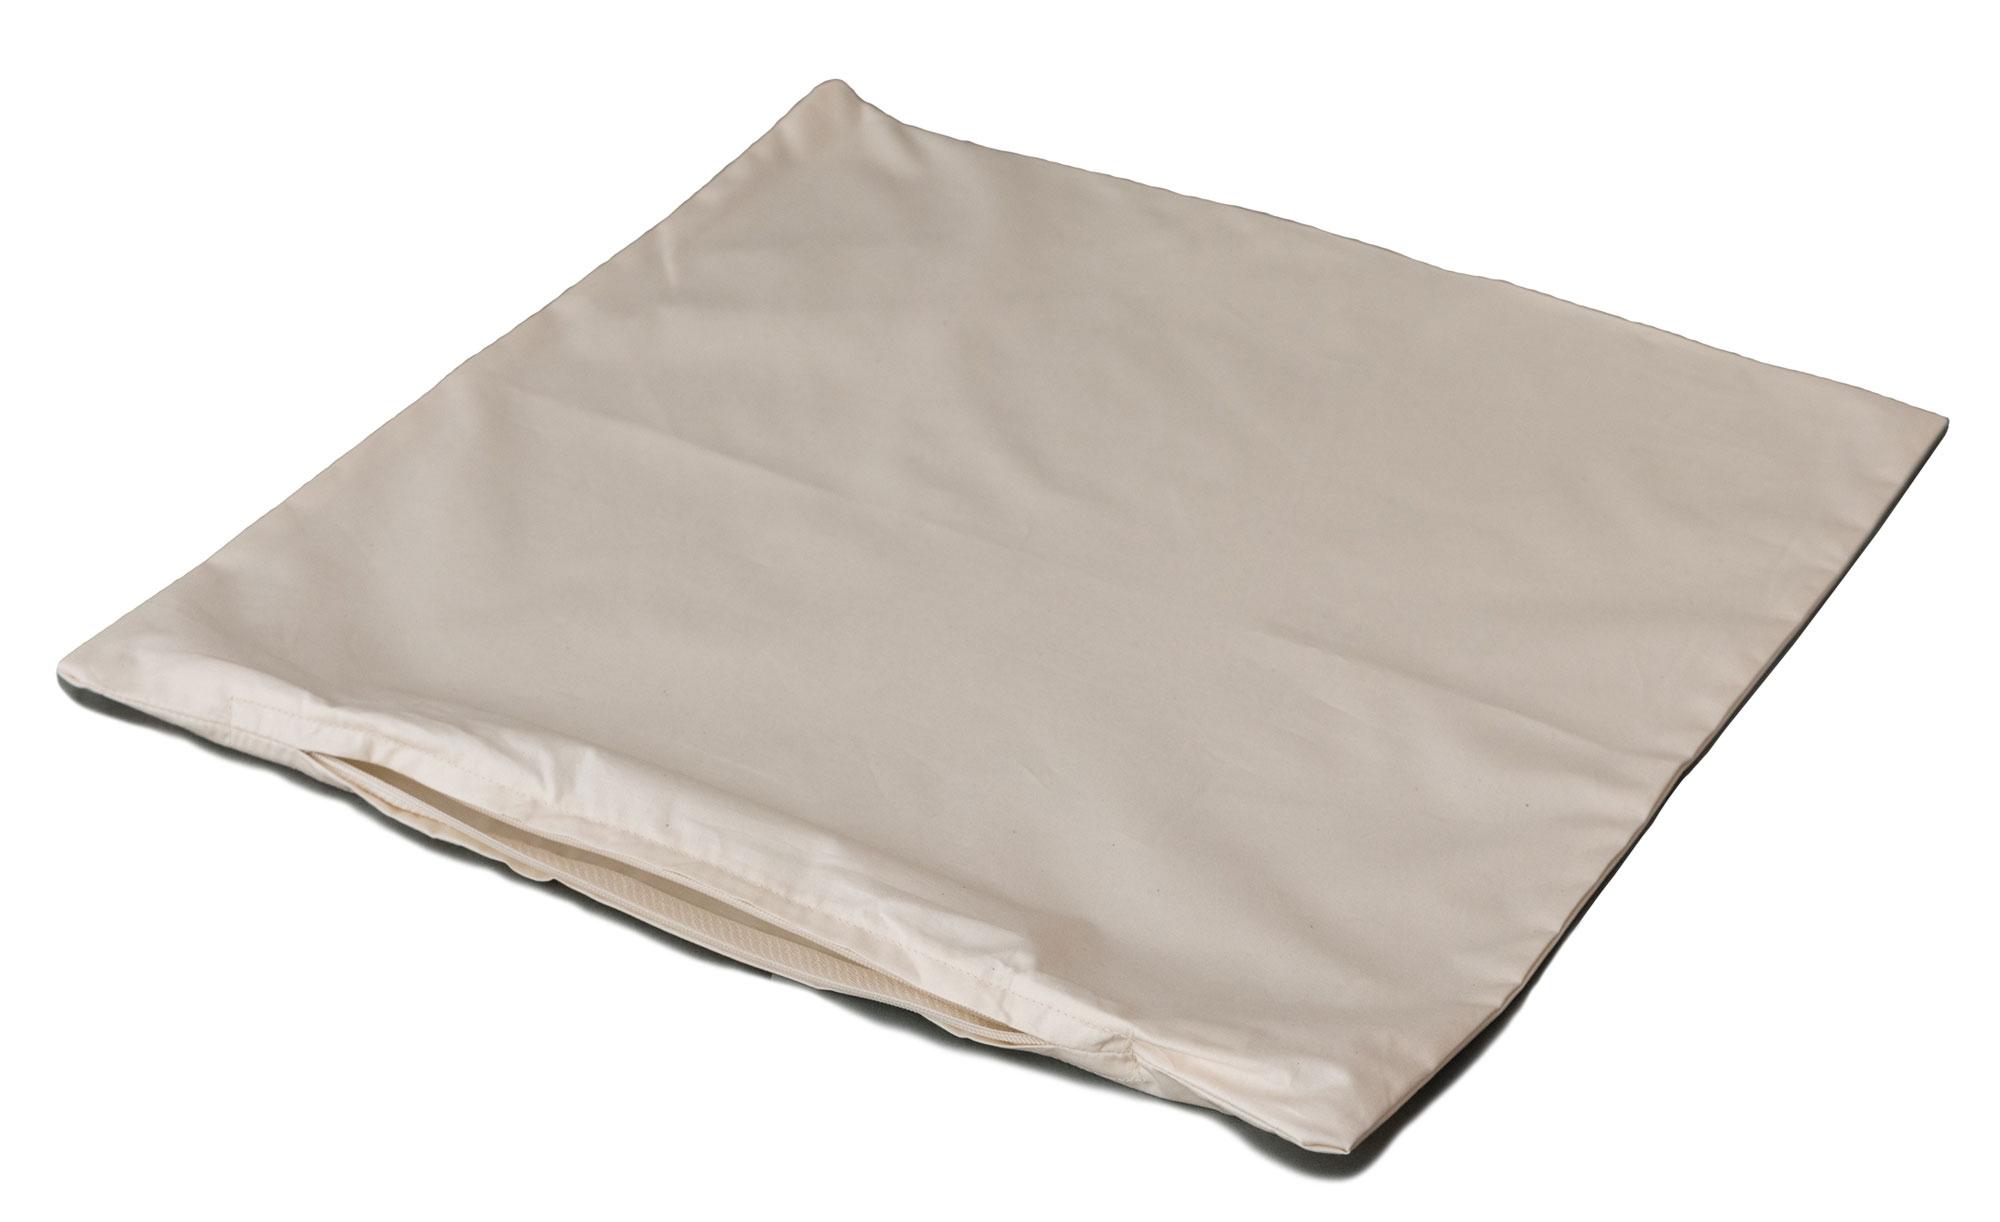 inletts selber f llen kissenbez ge giraffenland giraffenland. Black Bedroom Furniture Sets. Home Design Ideas